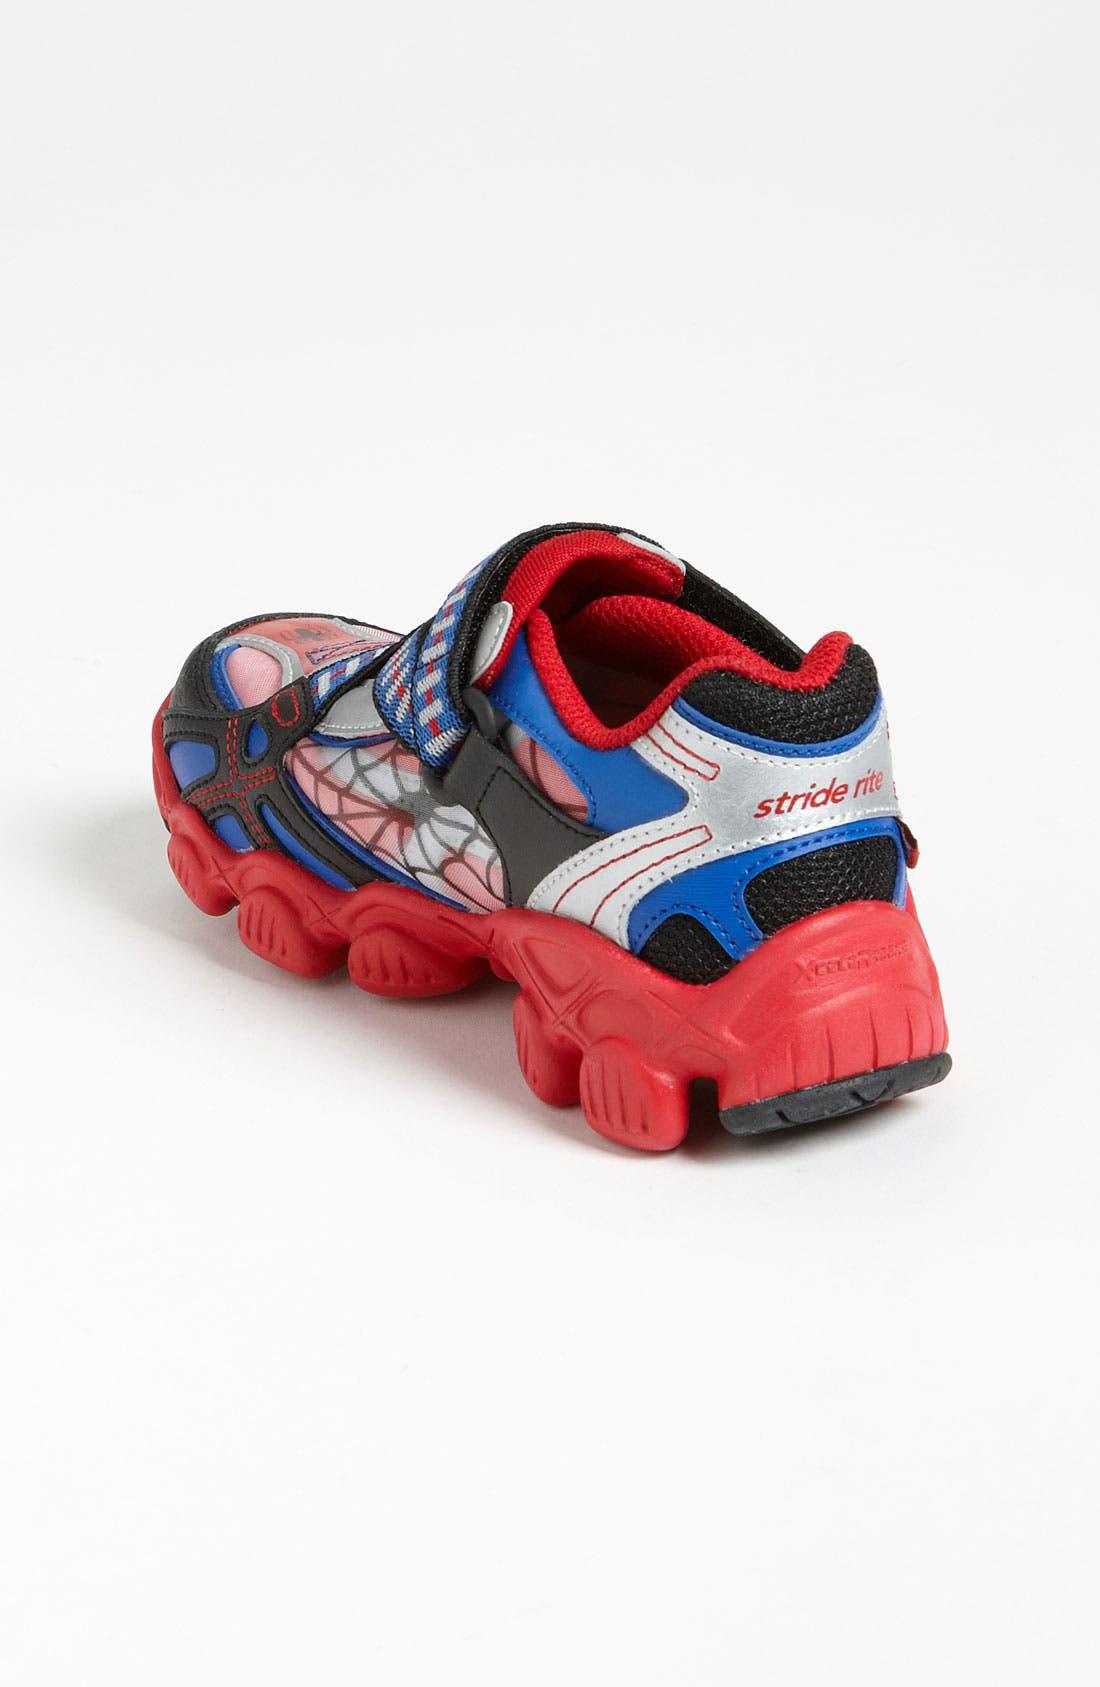 Alternate Image 2  - Stride Rite 'X-Celeracers Spider-Man®' Sneaker (Toddler & Little Kid)